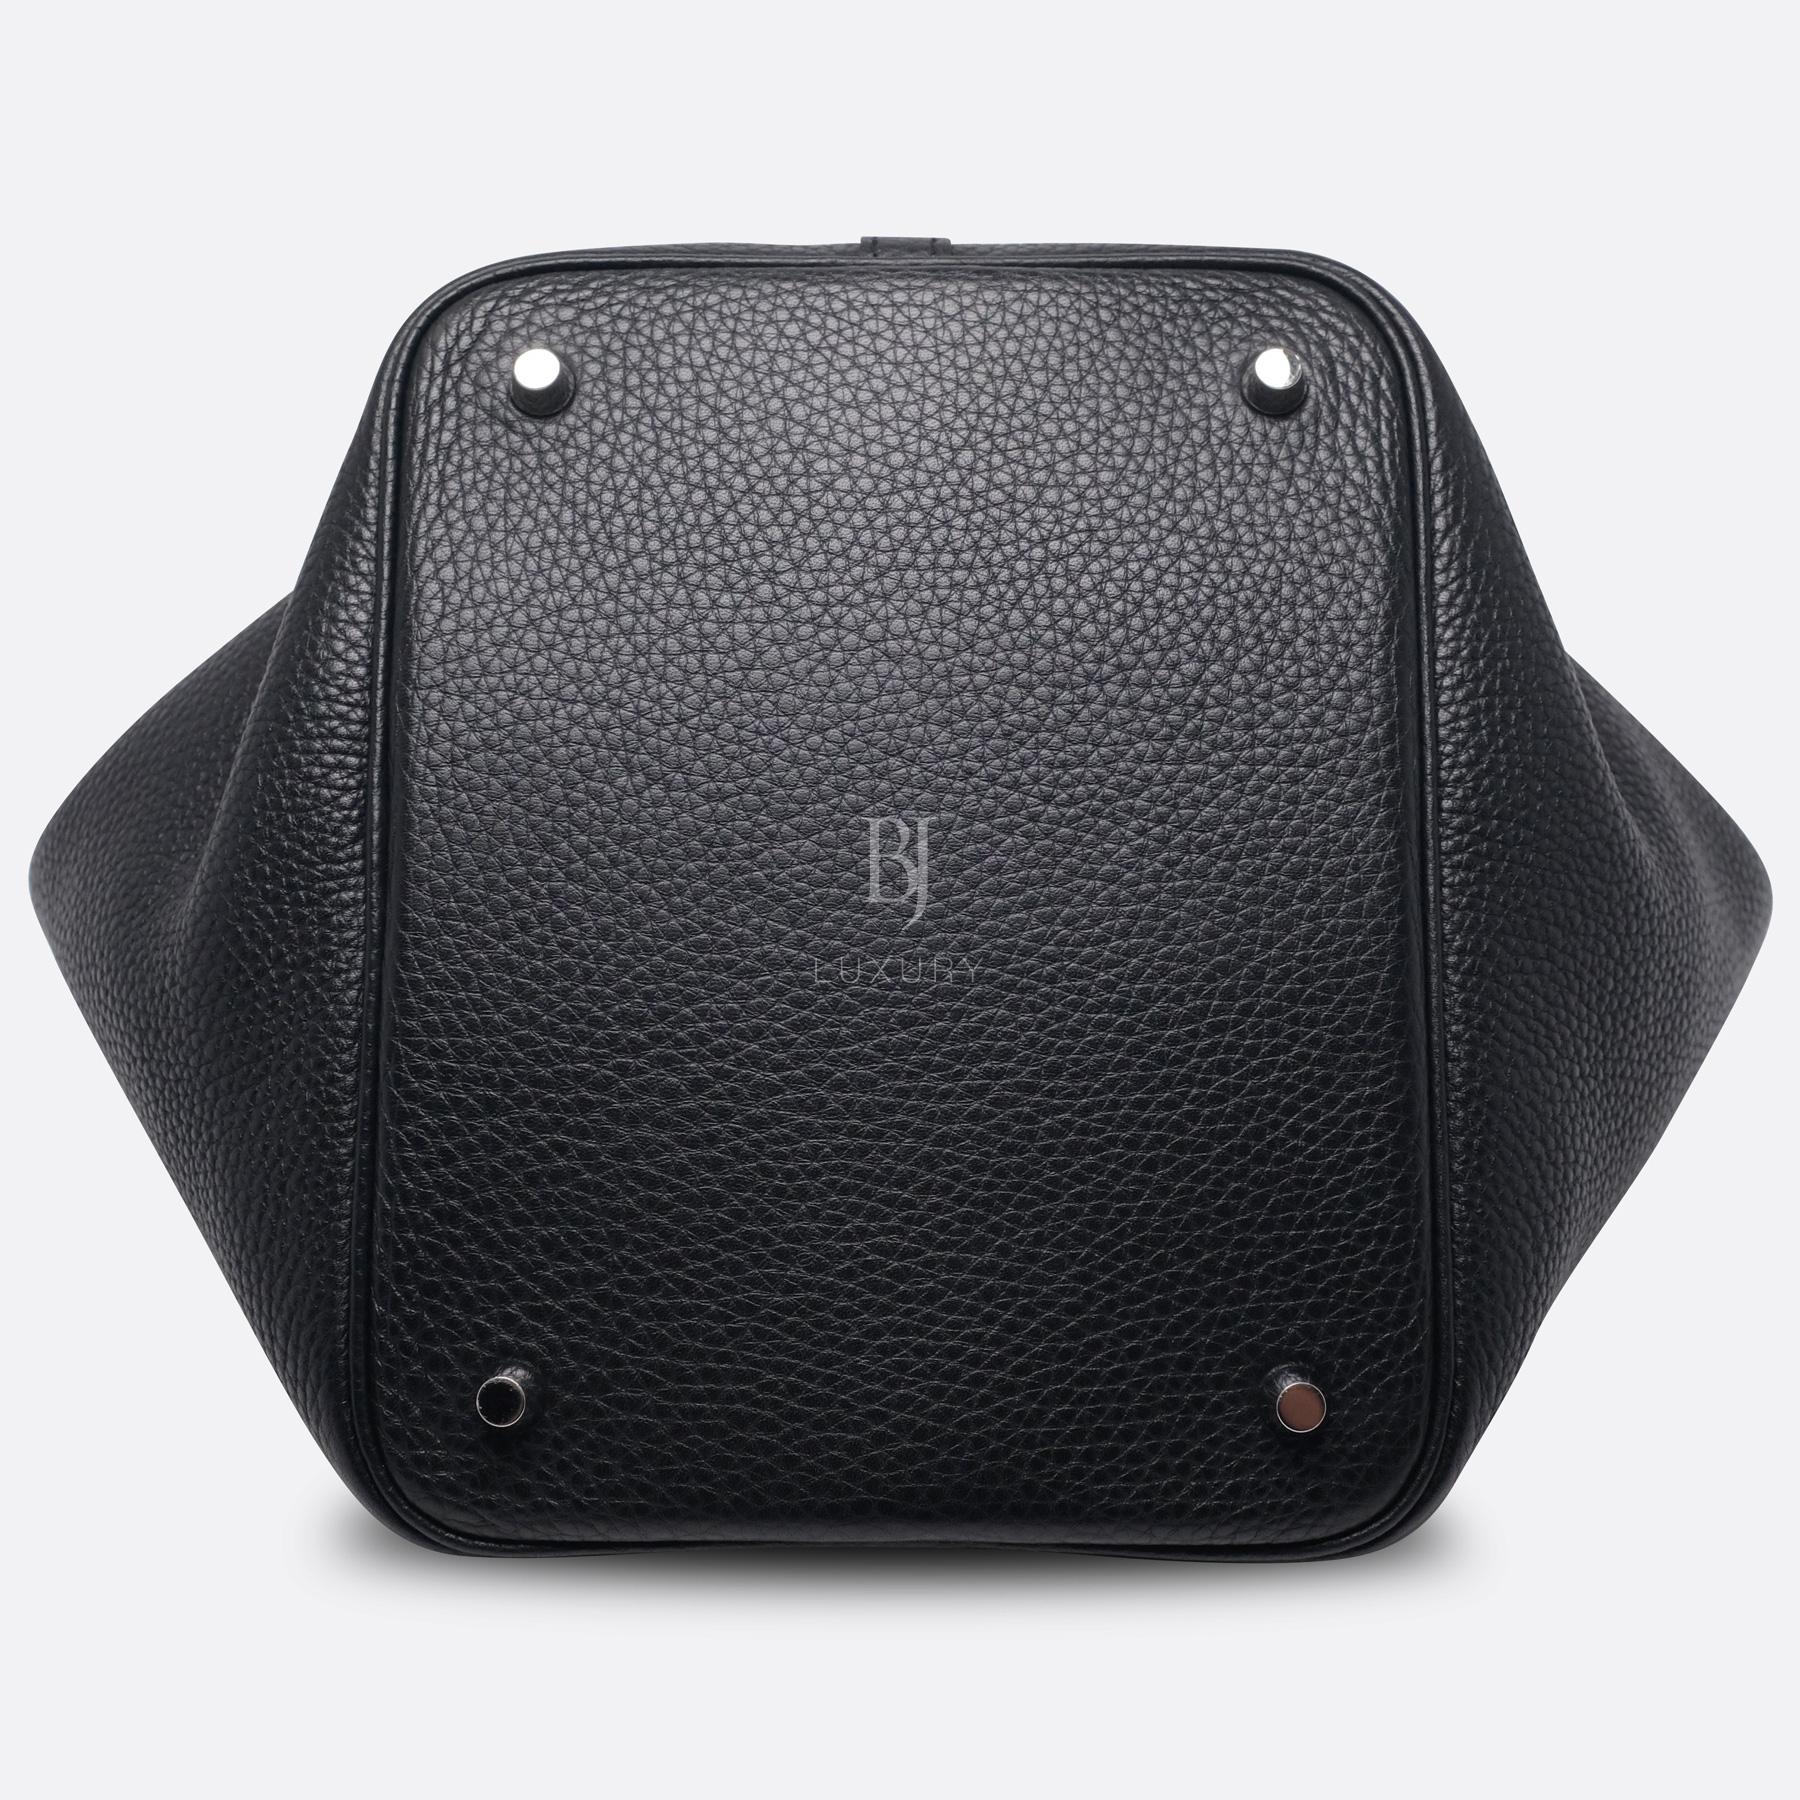 Hermes Picotin 22 Palladium Clemence BJ Luxury 7.jpg